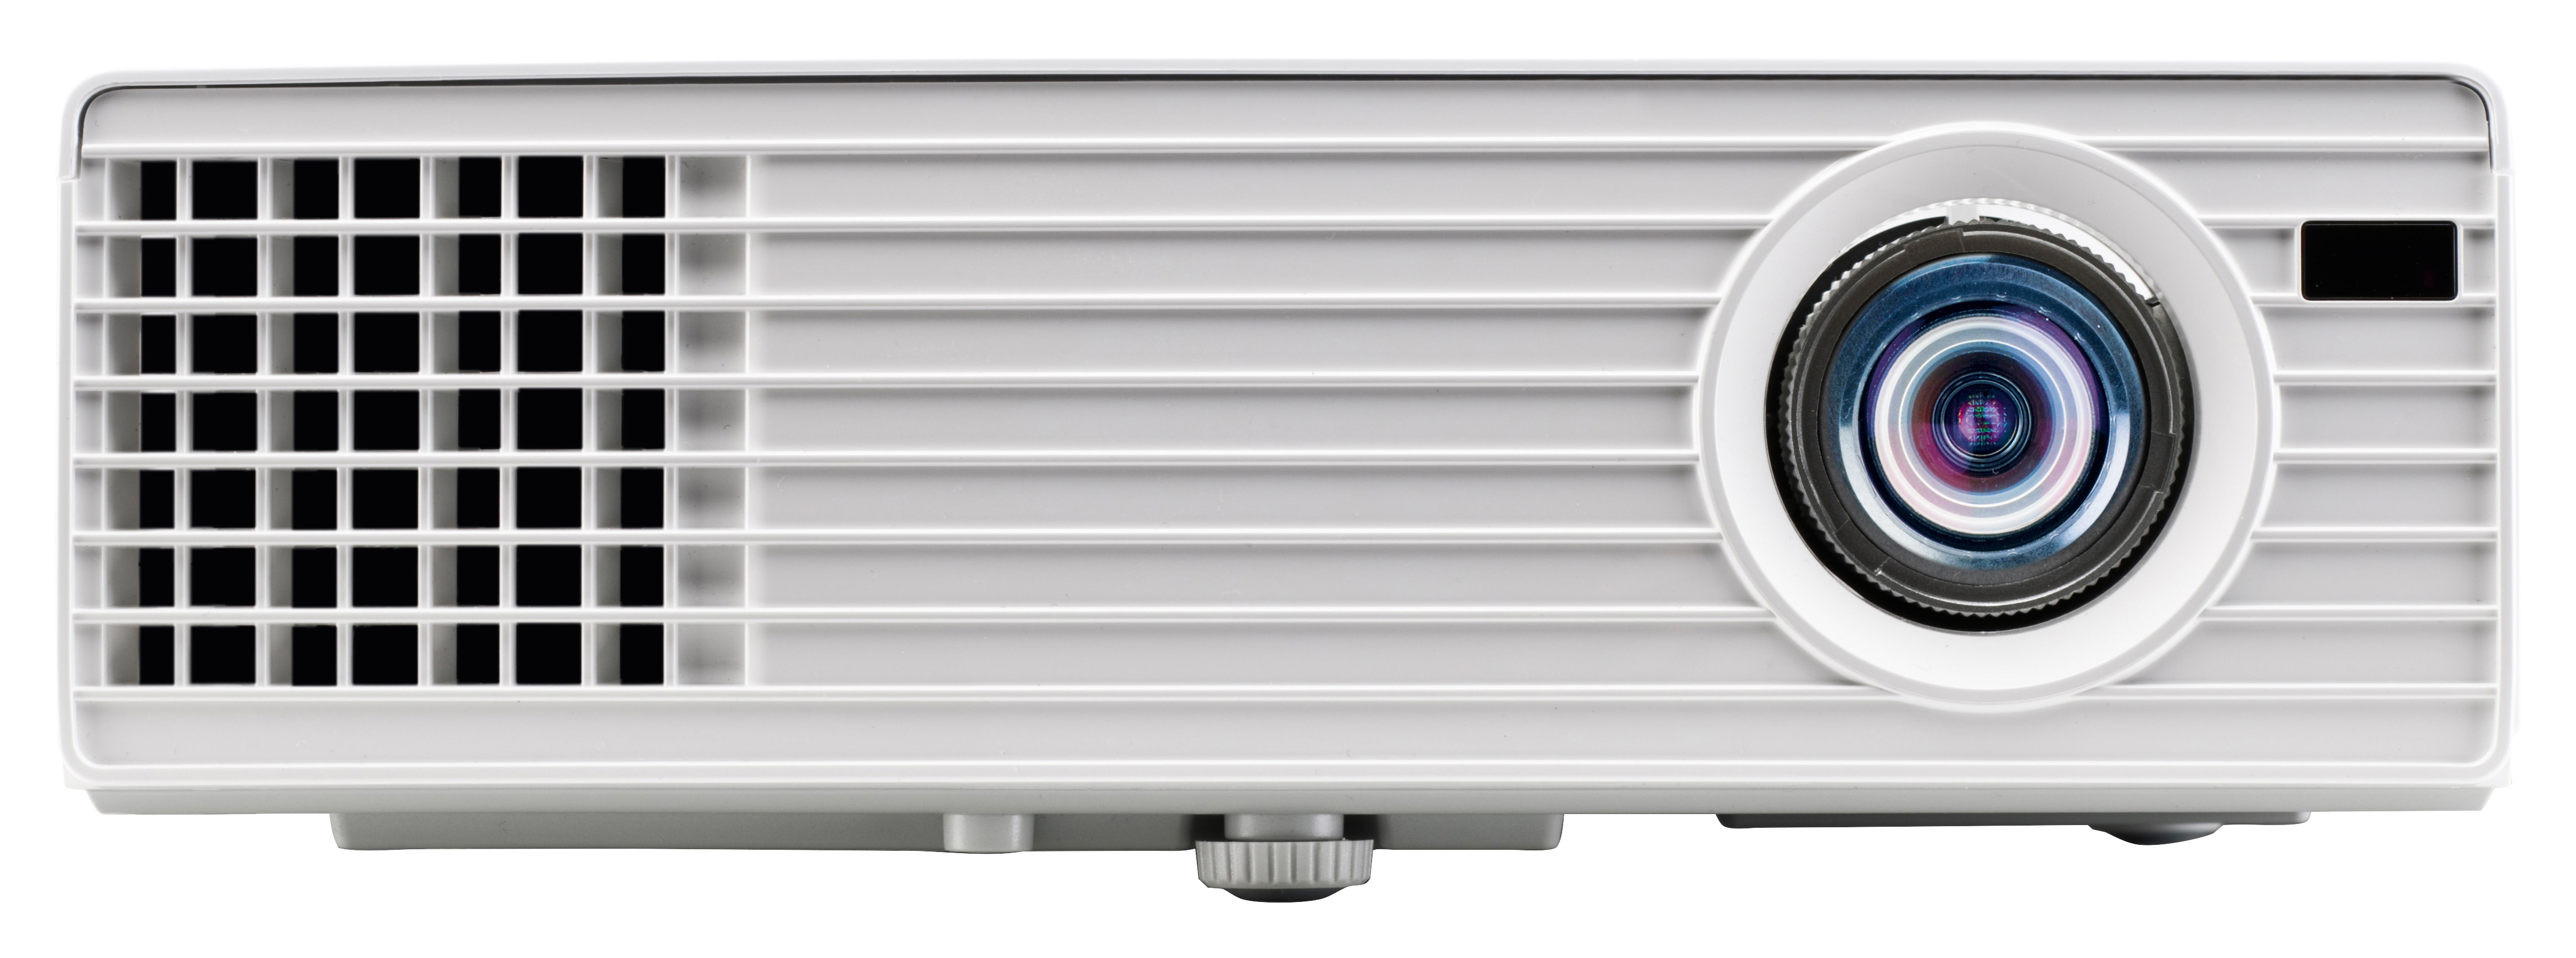 Hitachi Projektoren Cp Dh300 Hdtv Dlp Beamer X4041wn Wifi Projector Projektor